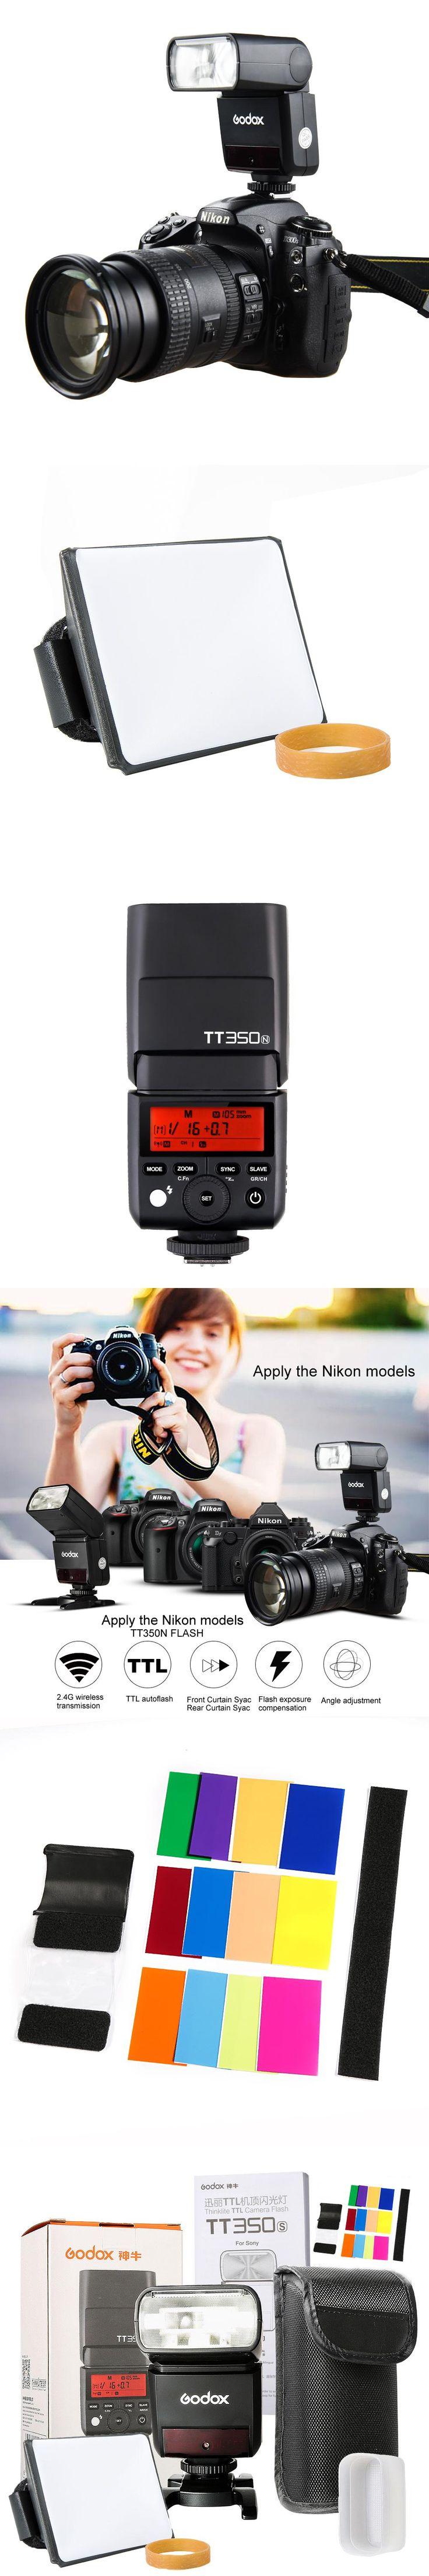 Godox Mini Thinklite i-TTL TT350N Camera Flash High Speed 1/8000s GN36 For Nikon Digital Camera with SoftBox+Color Filter Kit